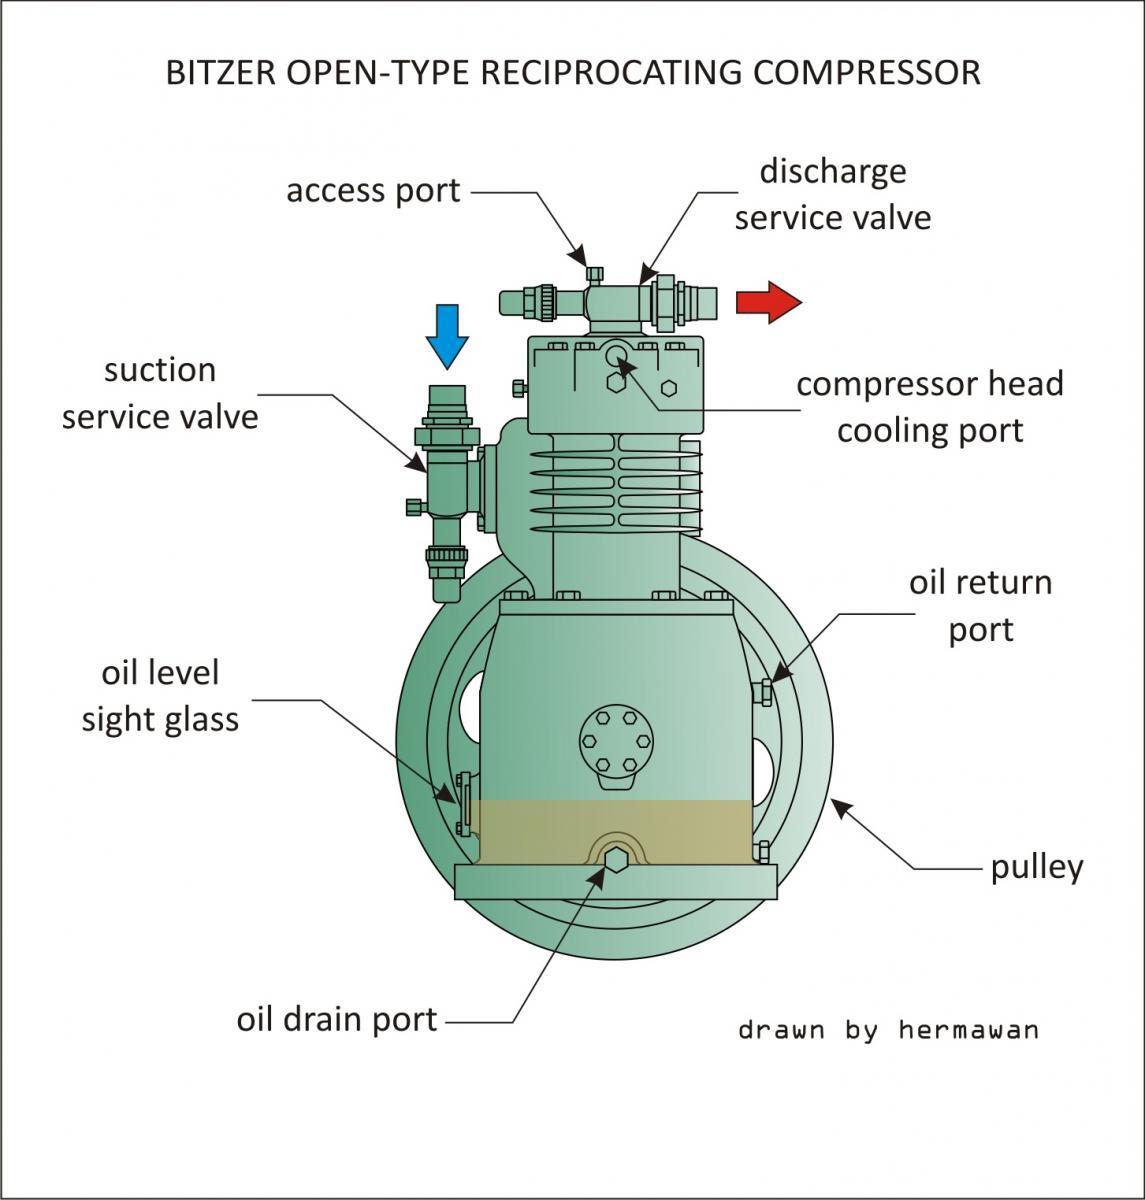 hight resolution of bitzer open type reciprocating compressor jpg members gallery rh mechanical engg com craftsman air compressor wiring